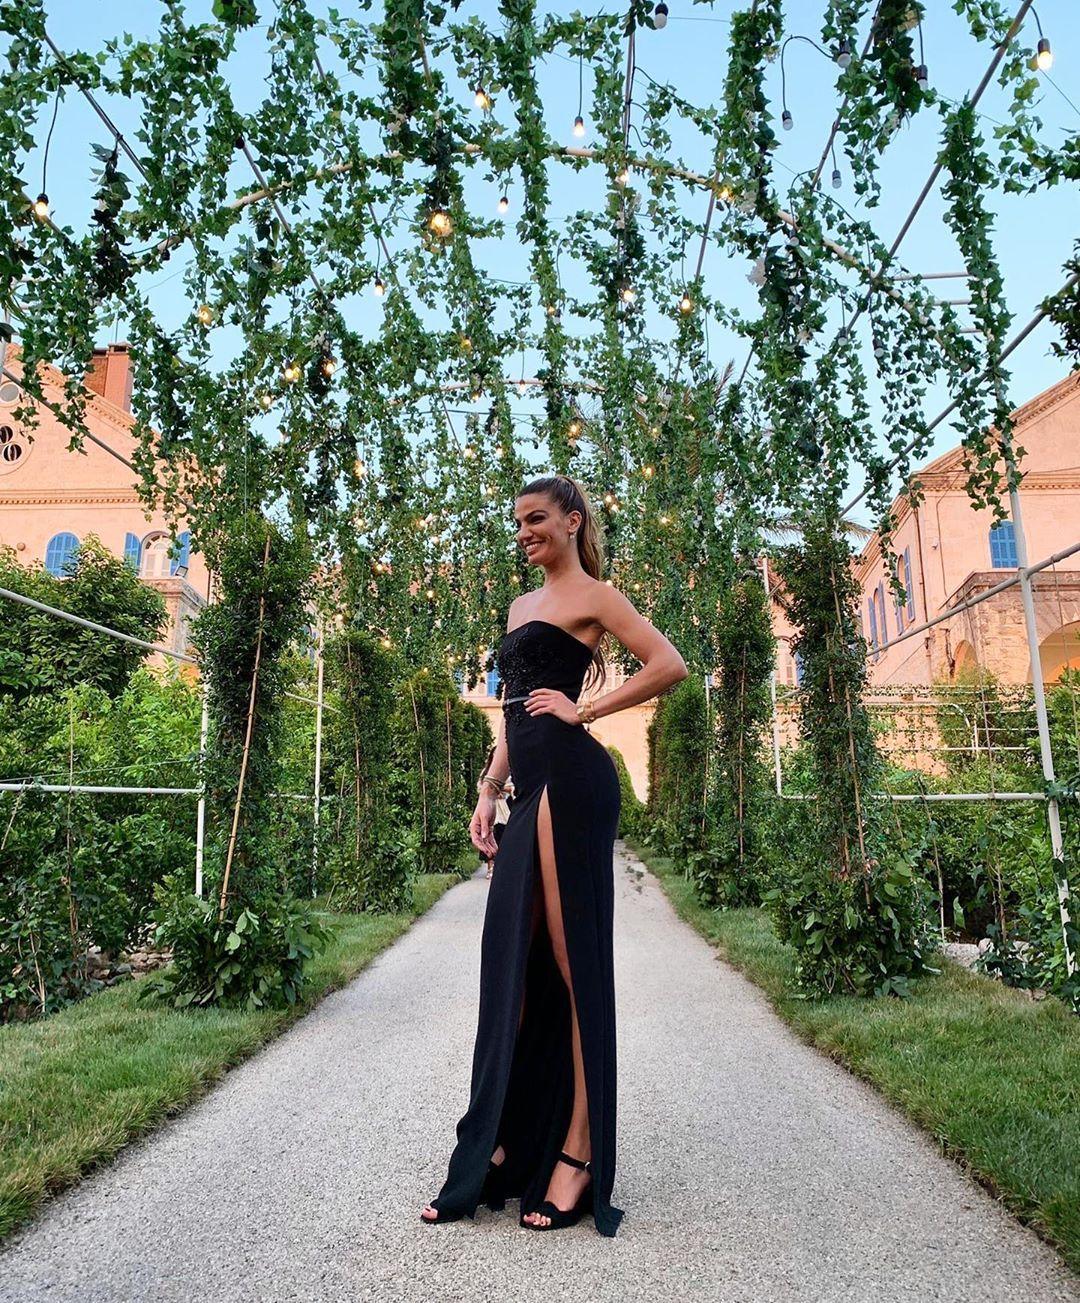 Bianca Brandolini D'Adda, ospite delle nozze di Elie Saab Jr e Christina Mourad